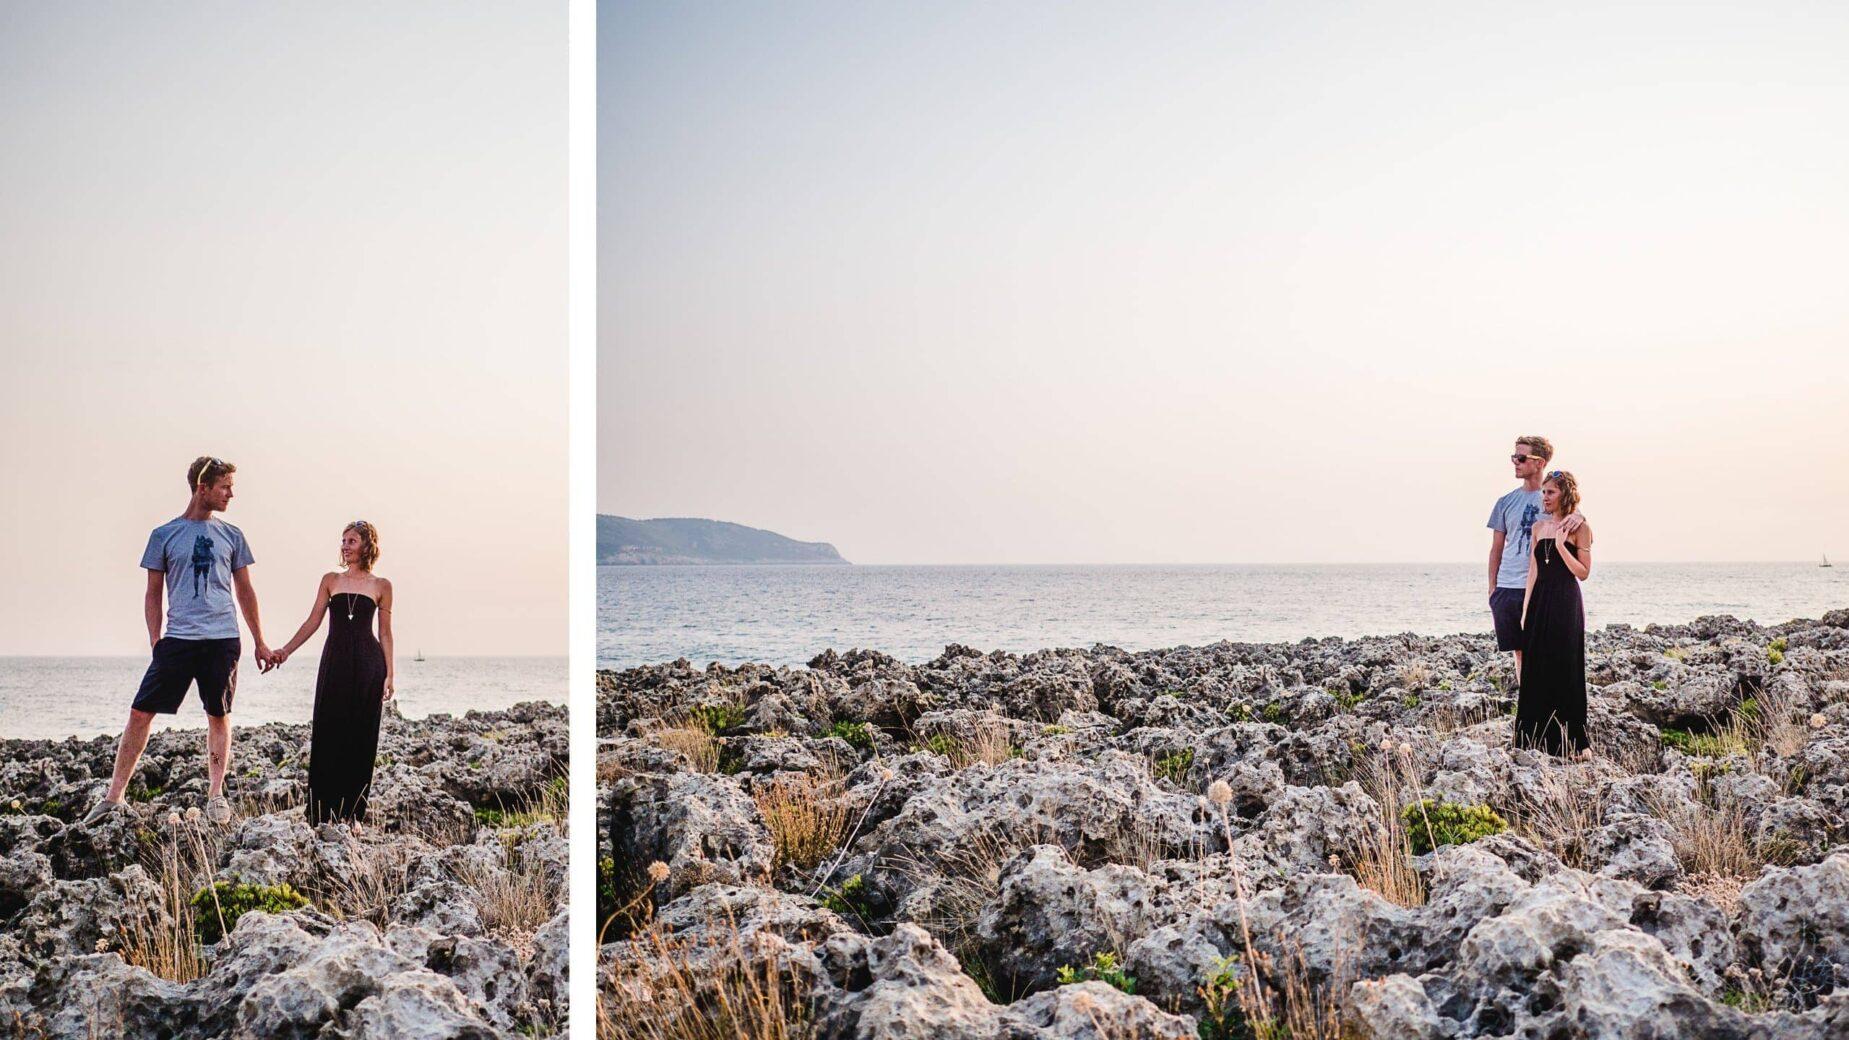 Pärchenfotos am Meer in Griechenland